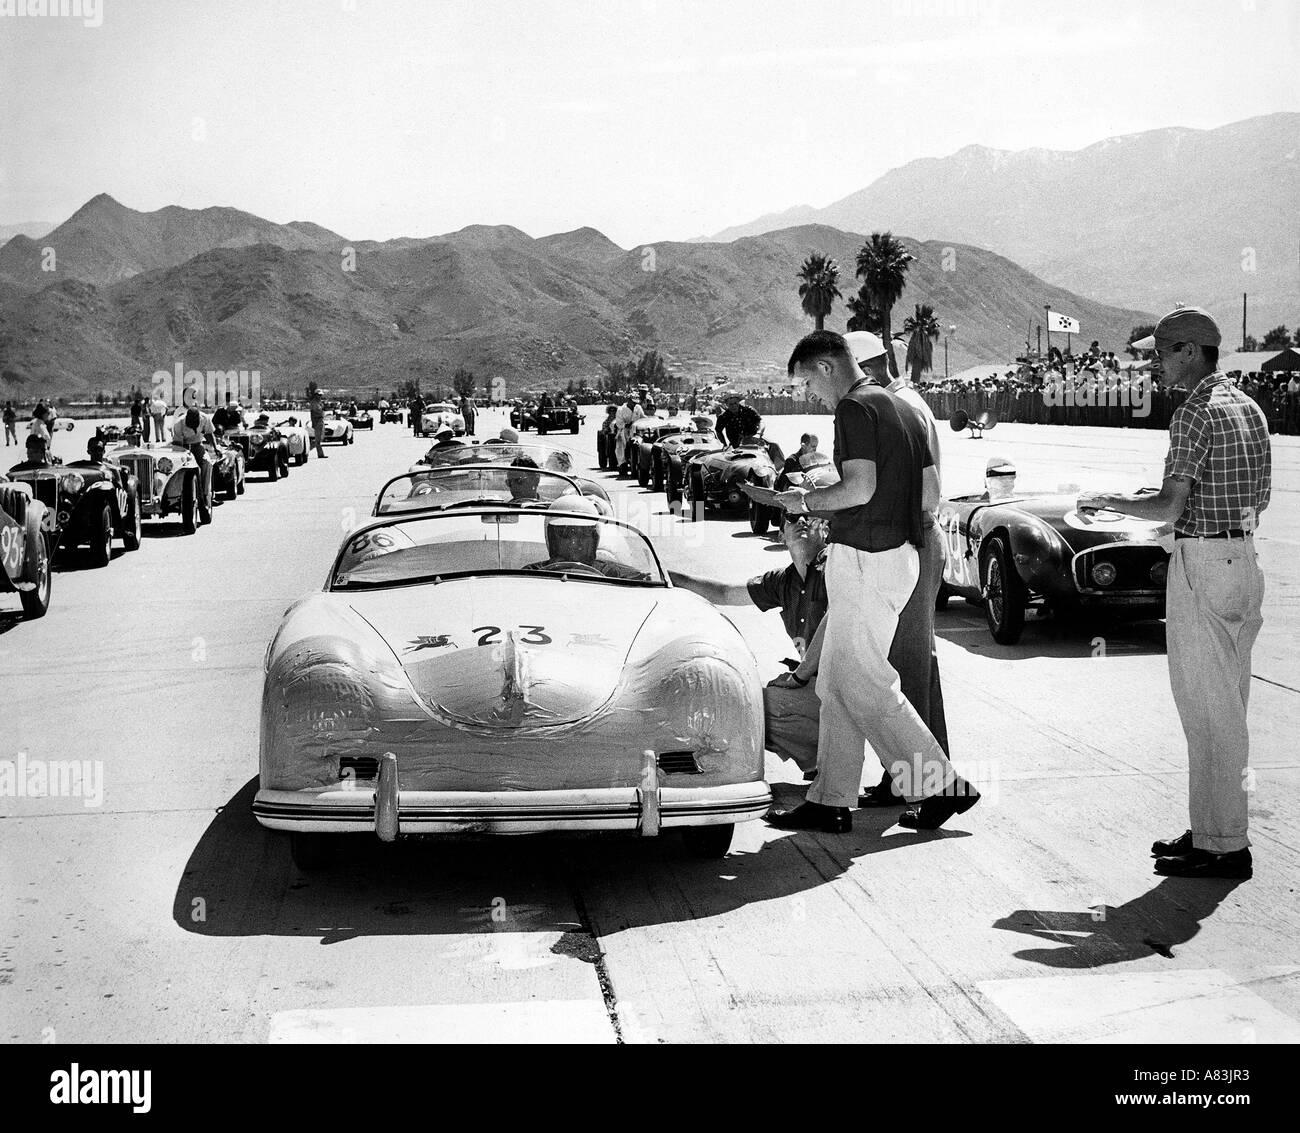 JAMES DEAN In A 1950s California Car Race Event Stock